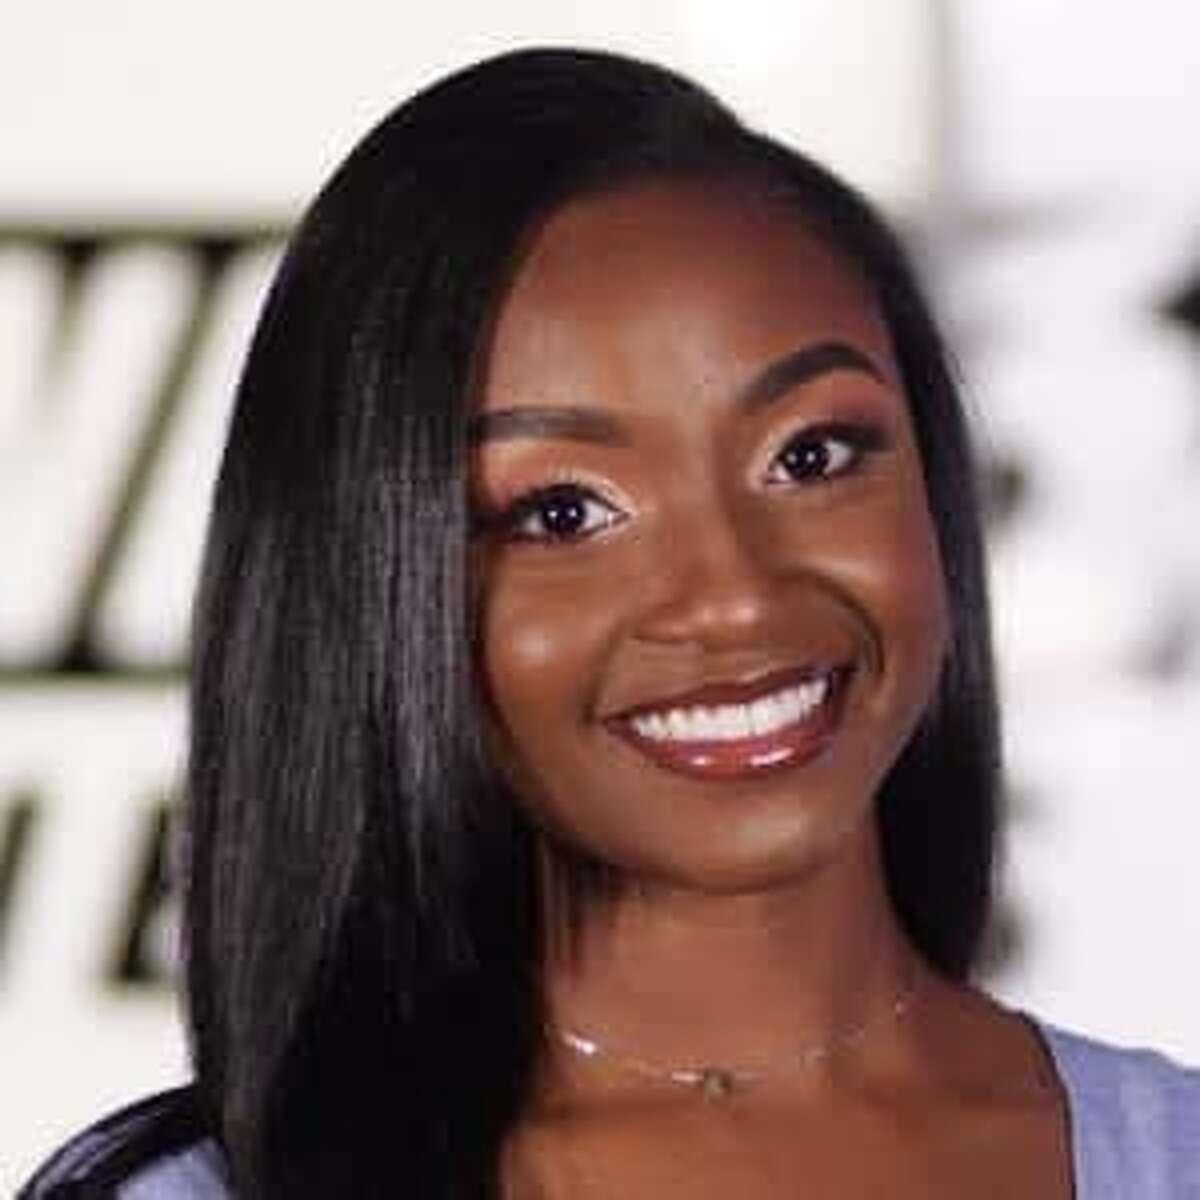 Faith King will co-anchor WNYT's weekday morning news starting September 27.